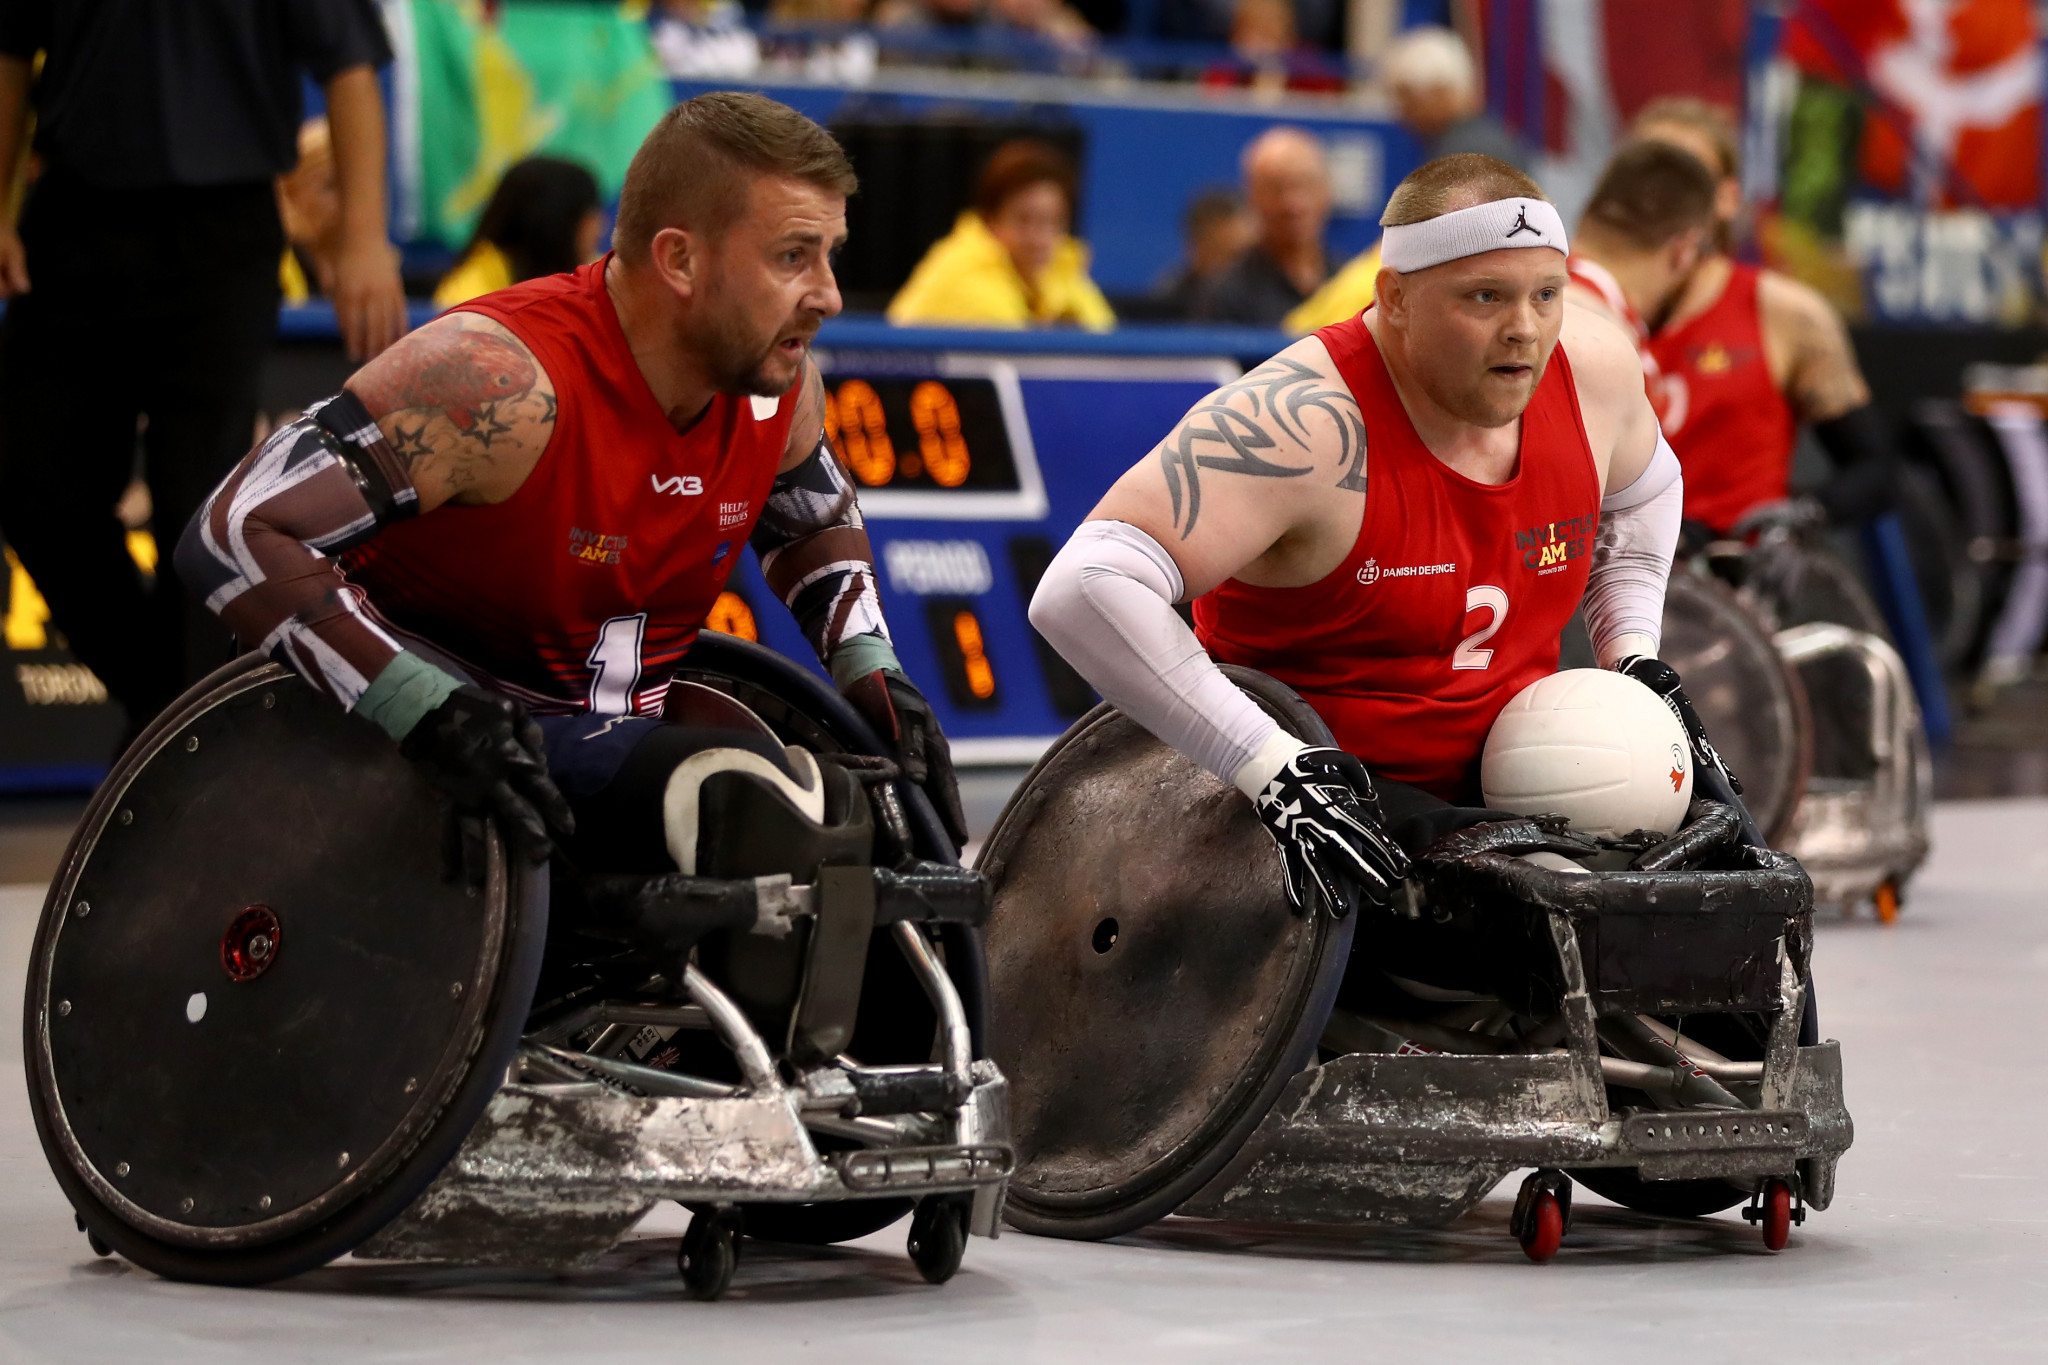 Denmark awarded 2022 Wheelchair Rugby World Championship